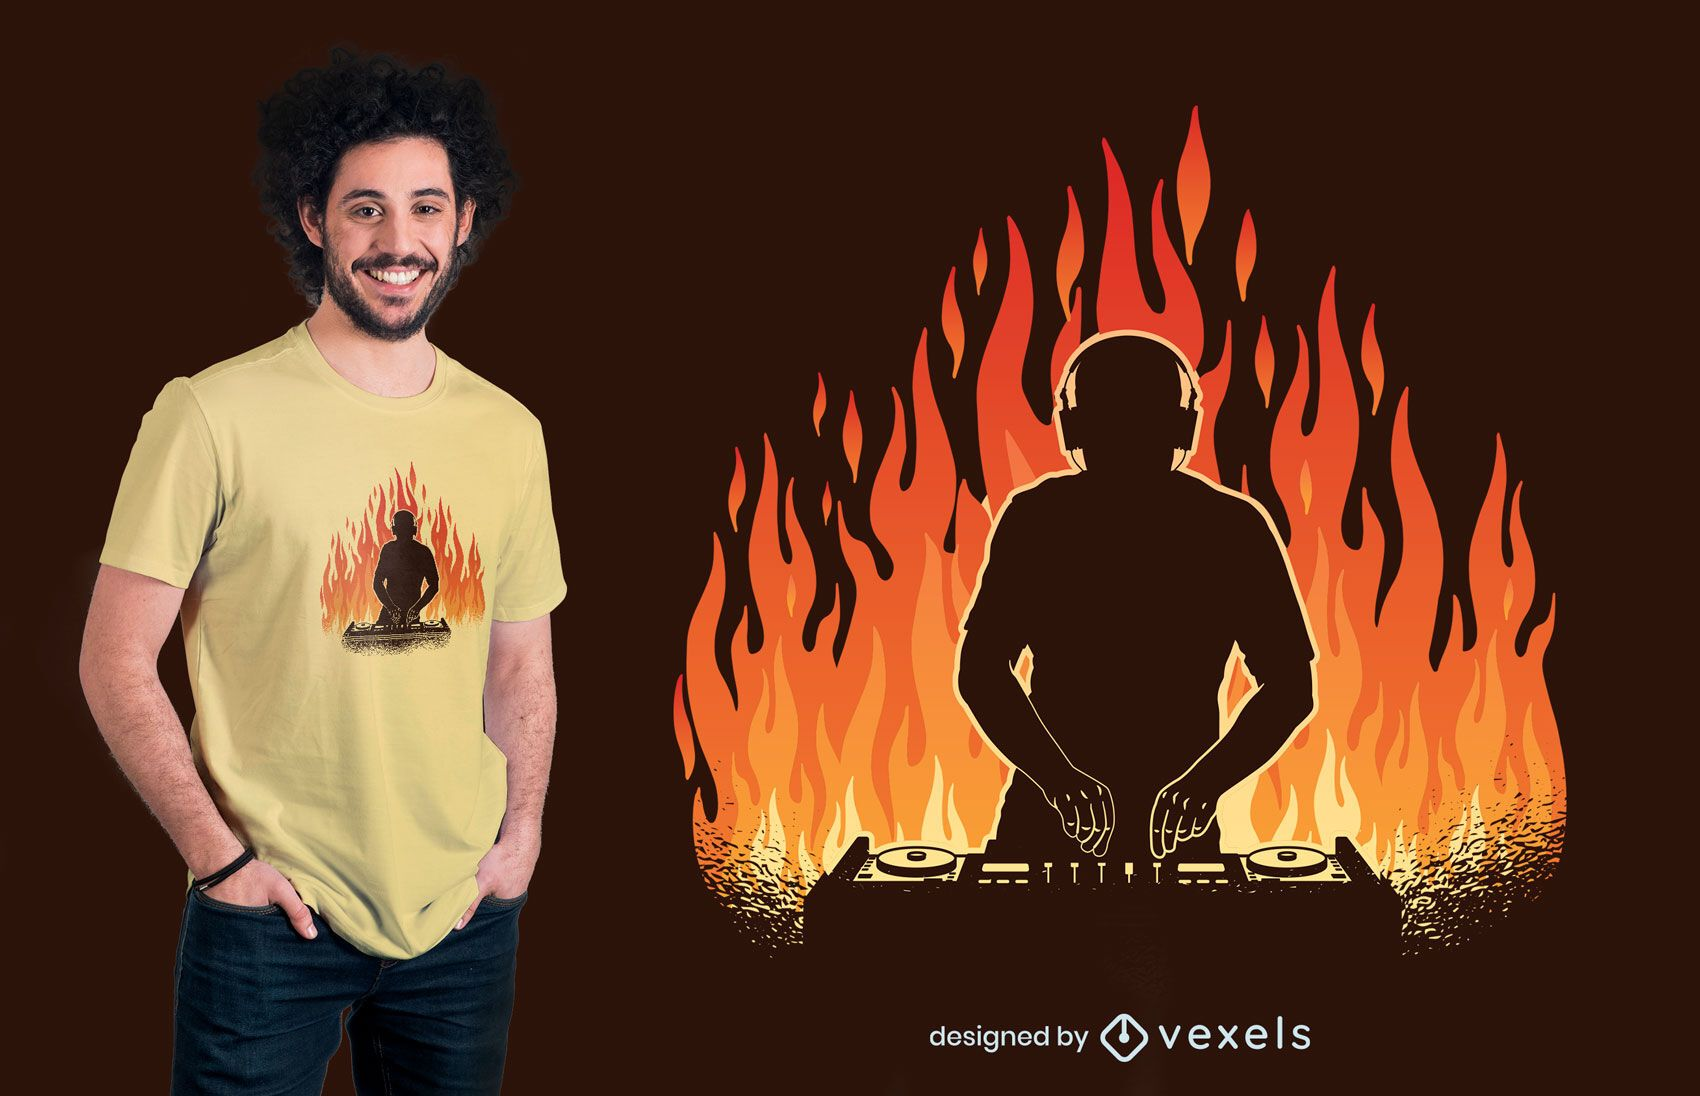 Dj in flames t-shirt design